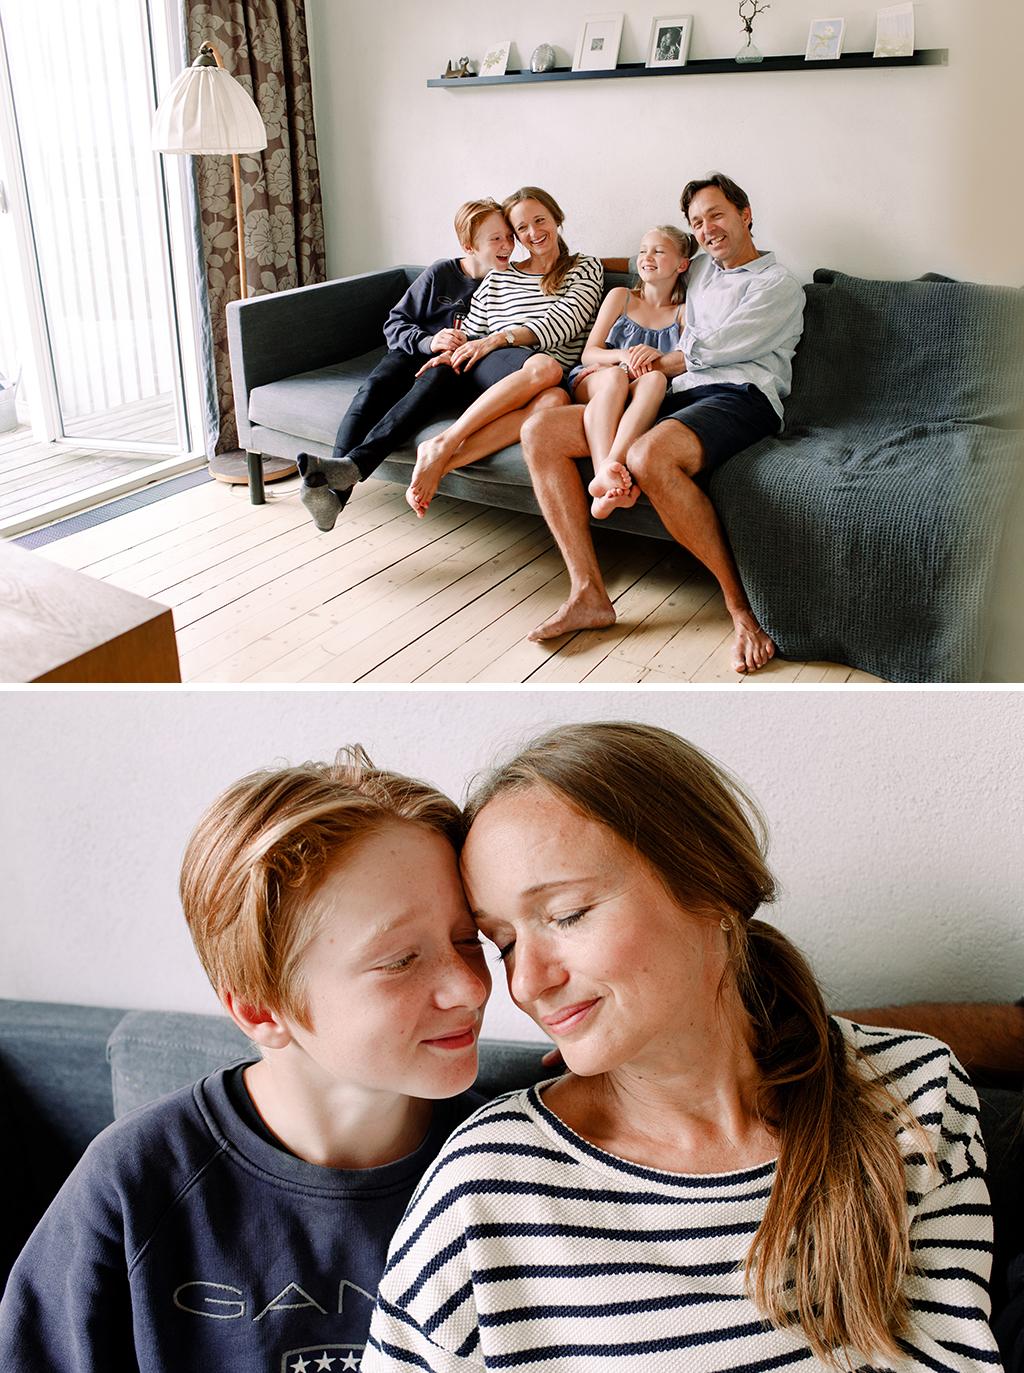 Hemmahosfotografering_Lifestyle_familjefotograf_Stockholm.jpg